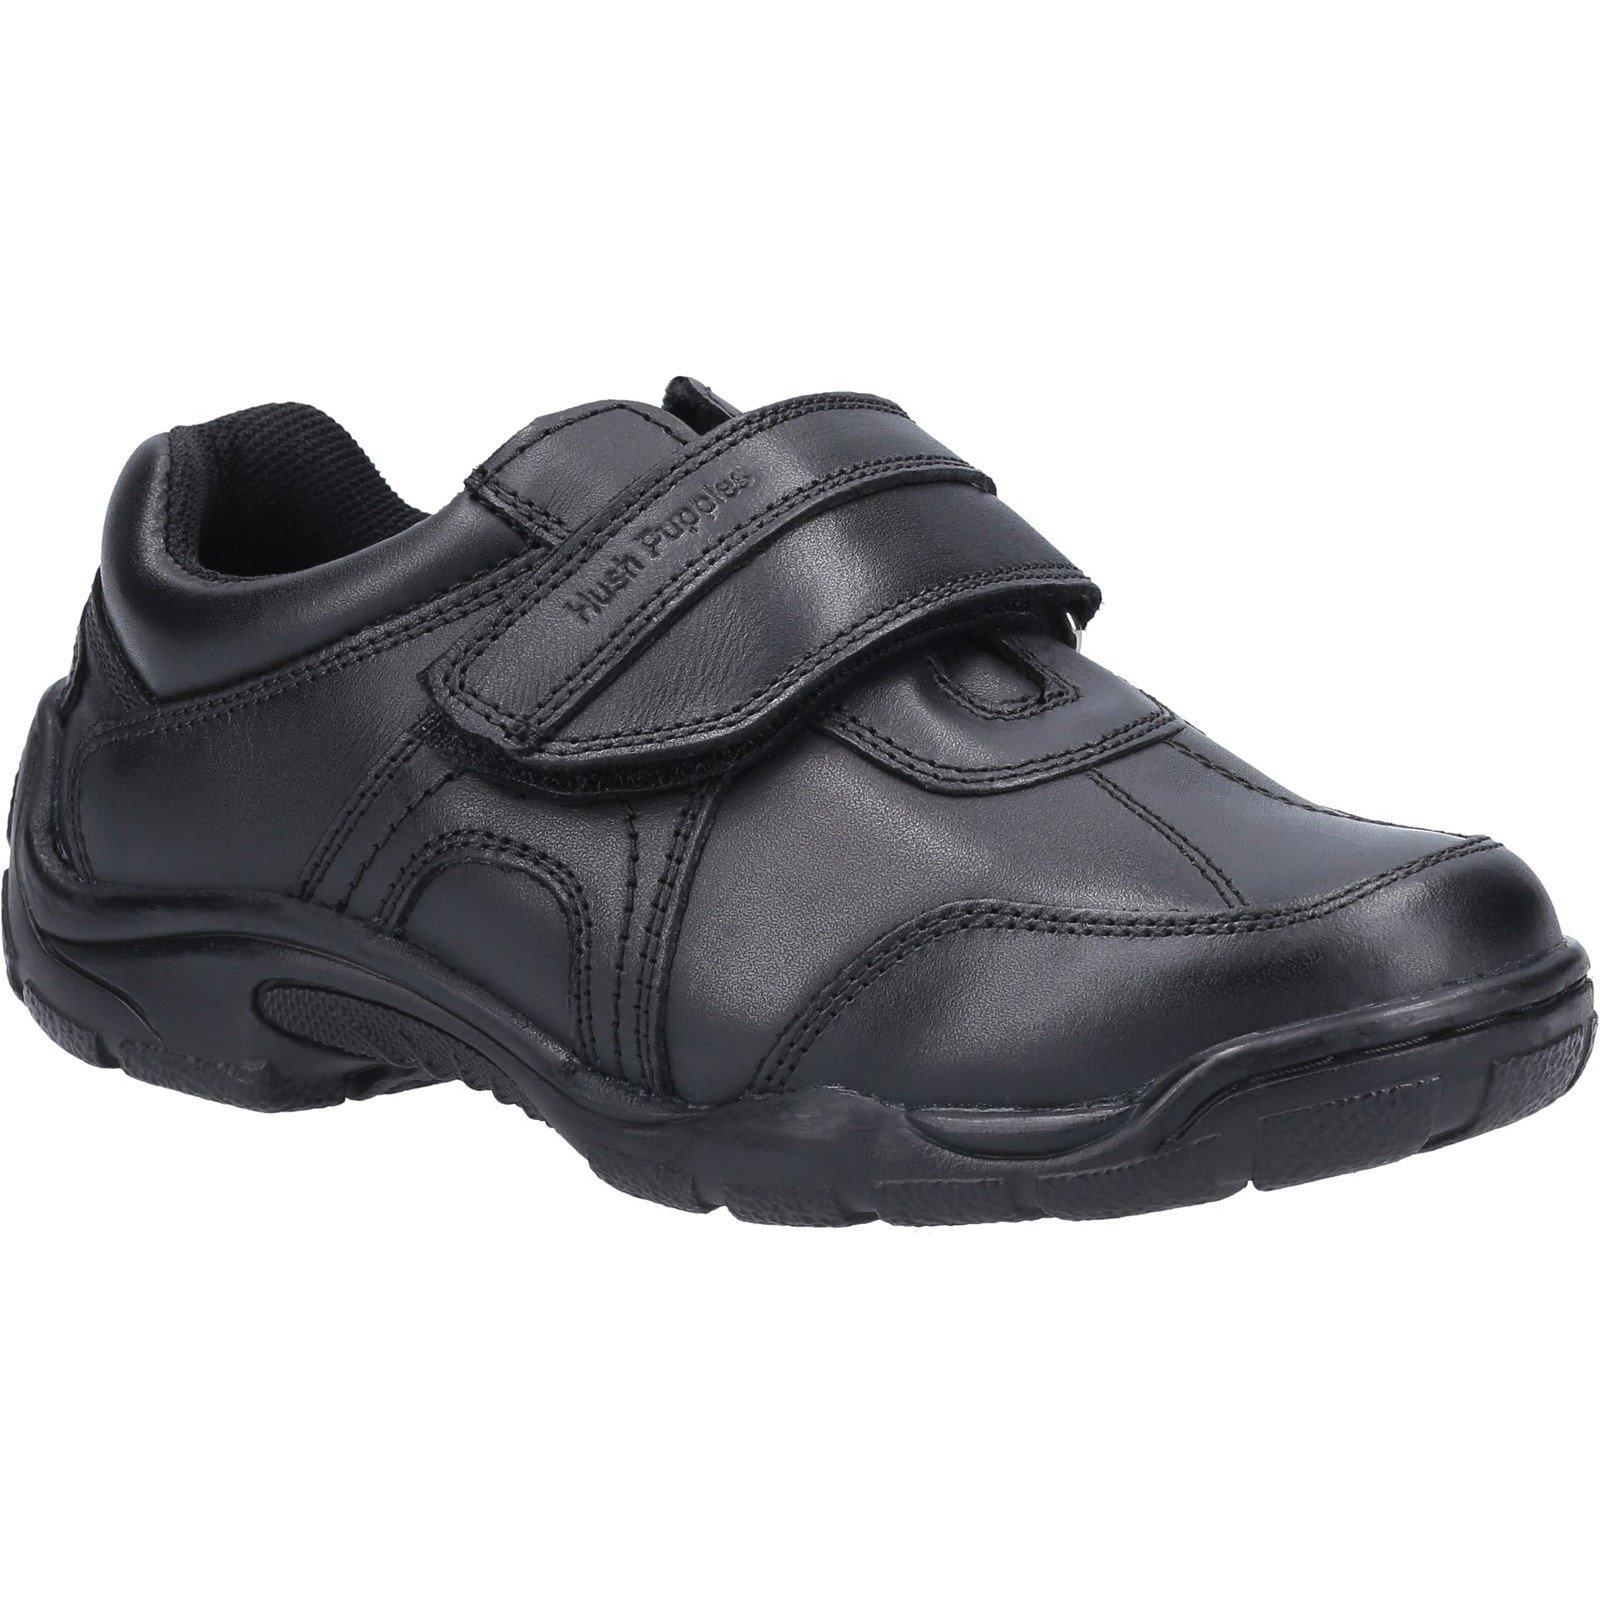 Hush Puppies Kid's Arlo Junior School Shoe Black 30853 - Black 10